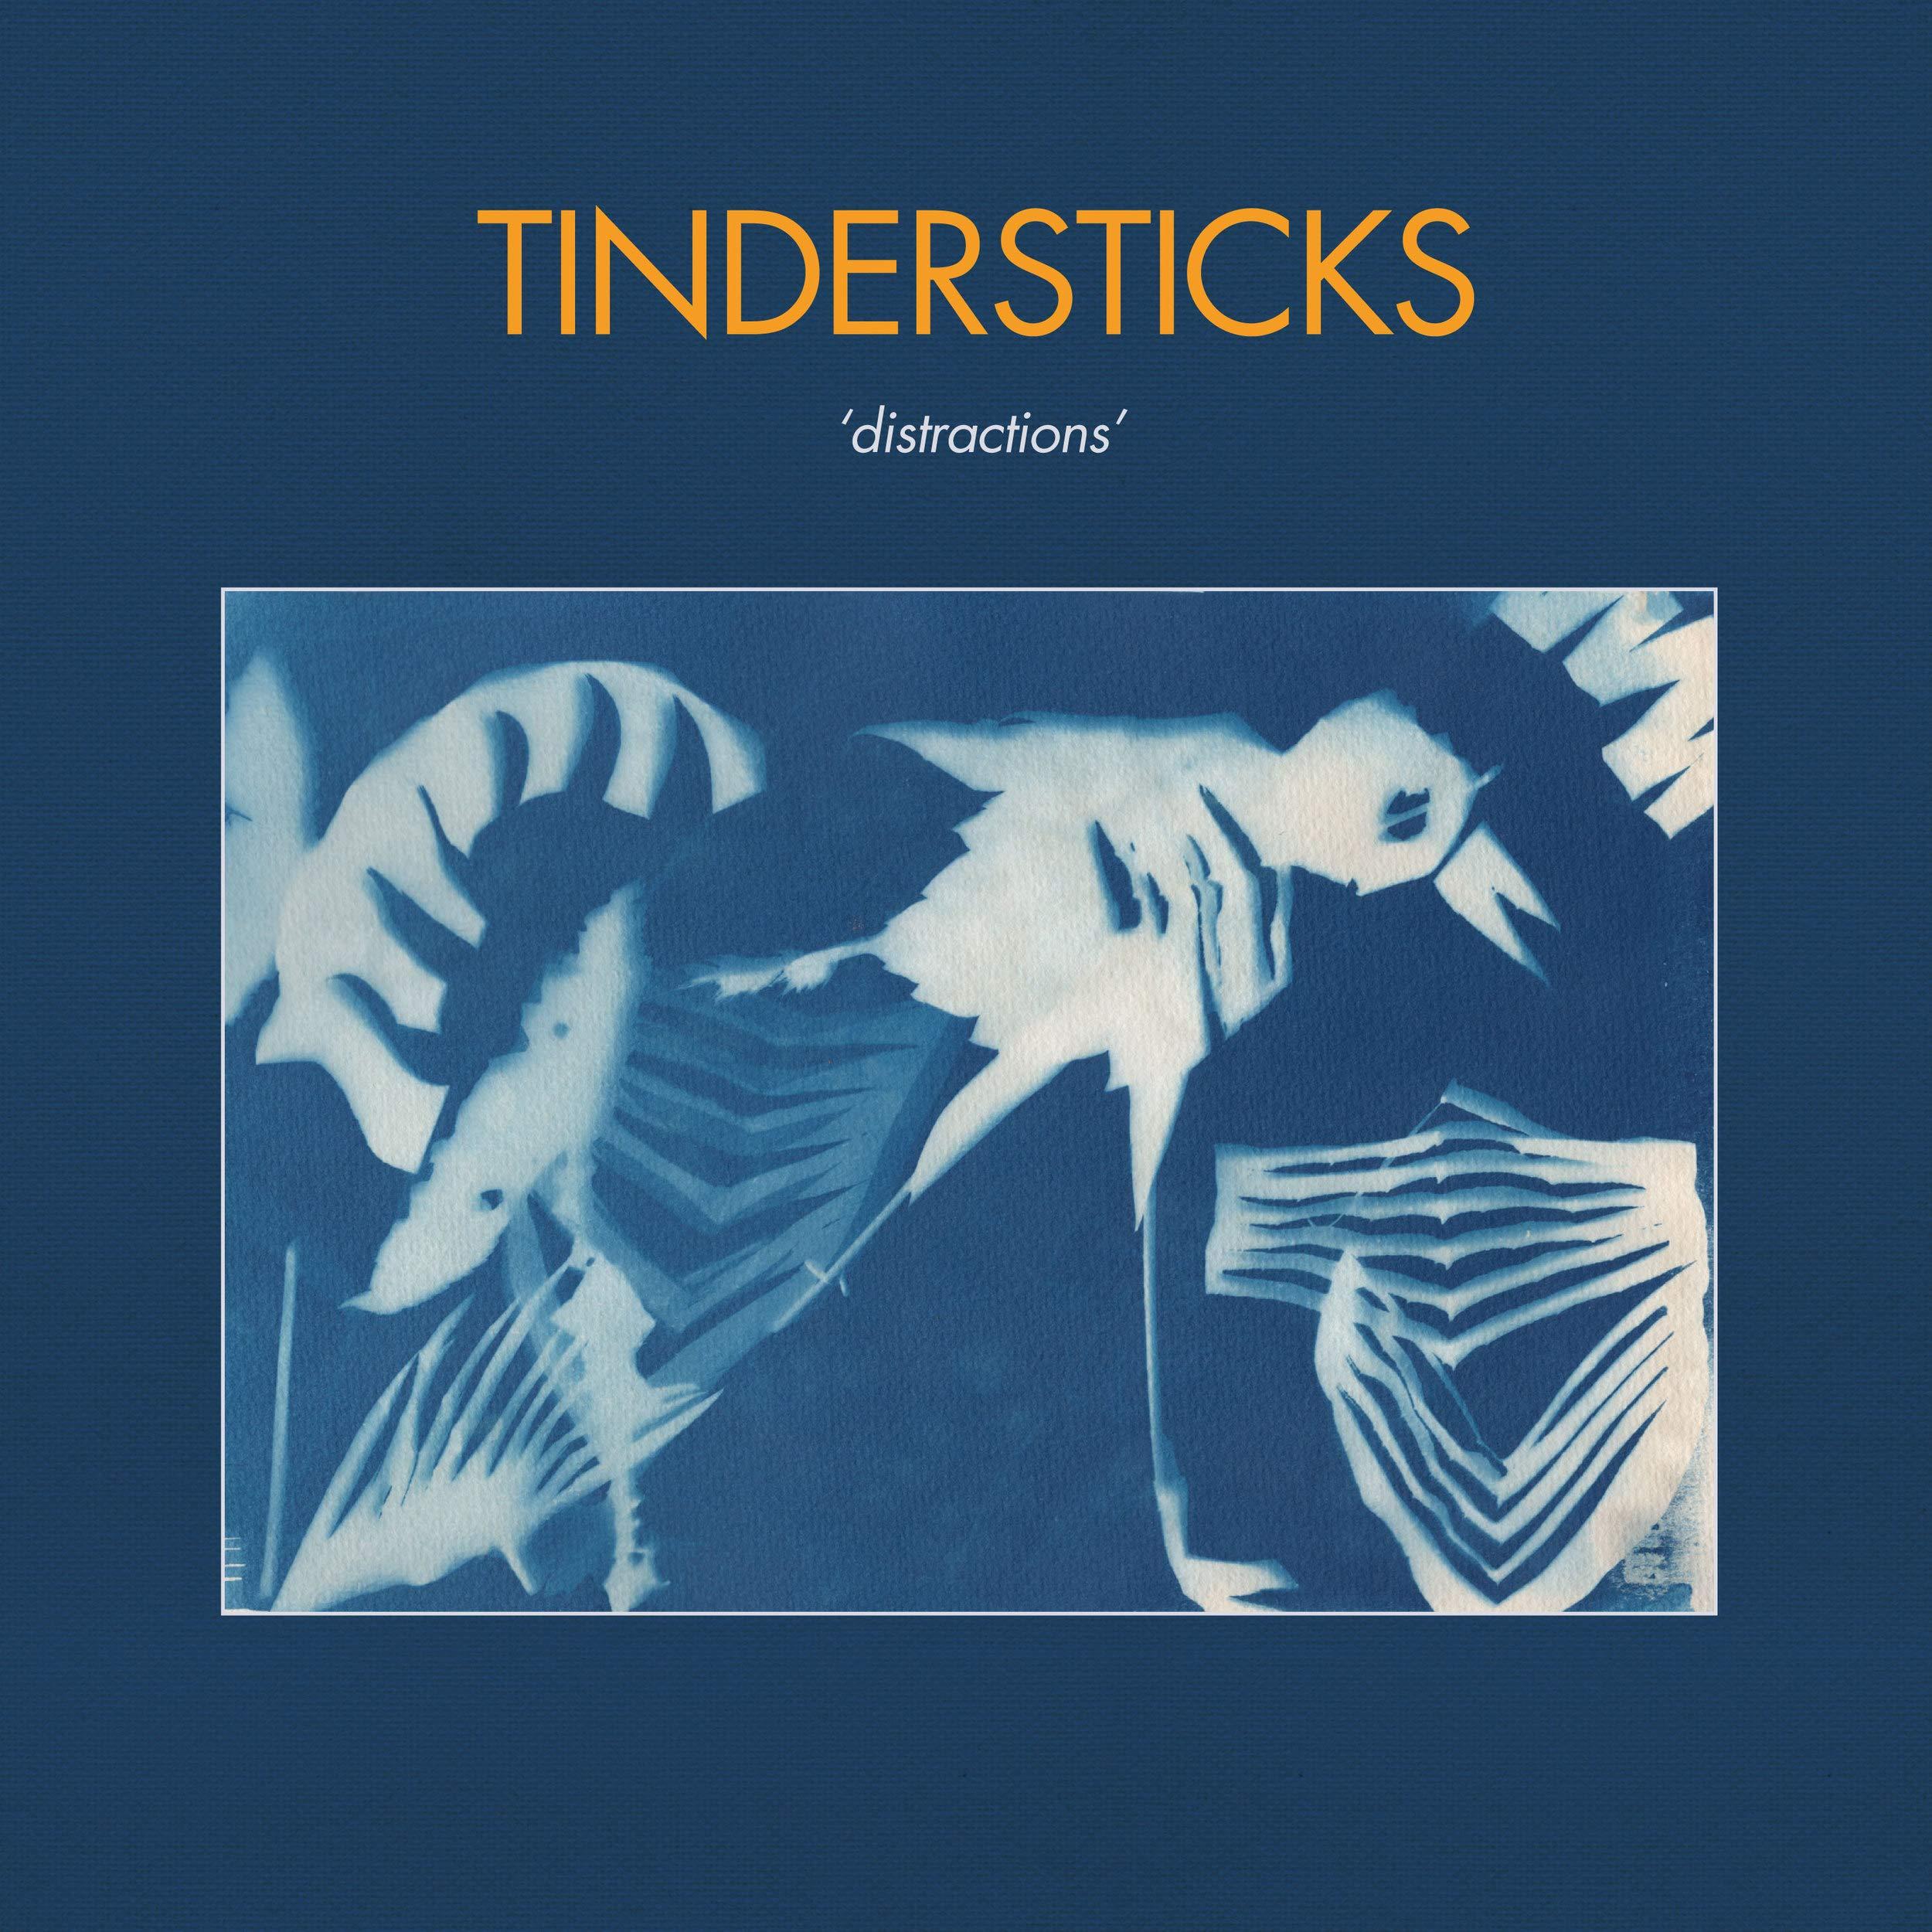 Tindersticks - Distractions (2021) [FLAC] Download